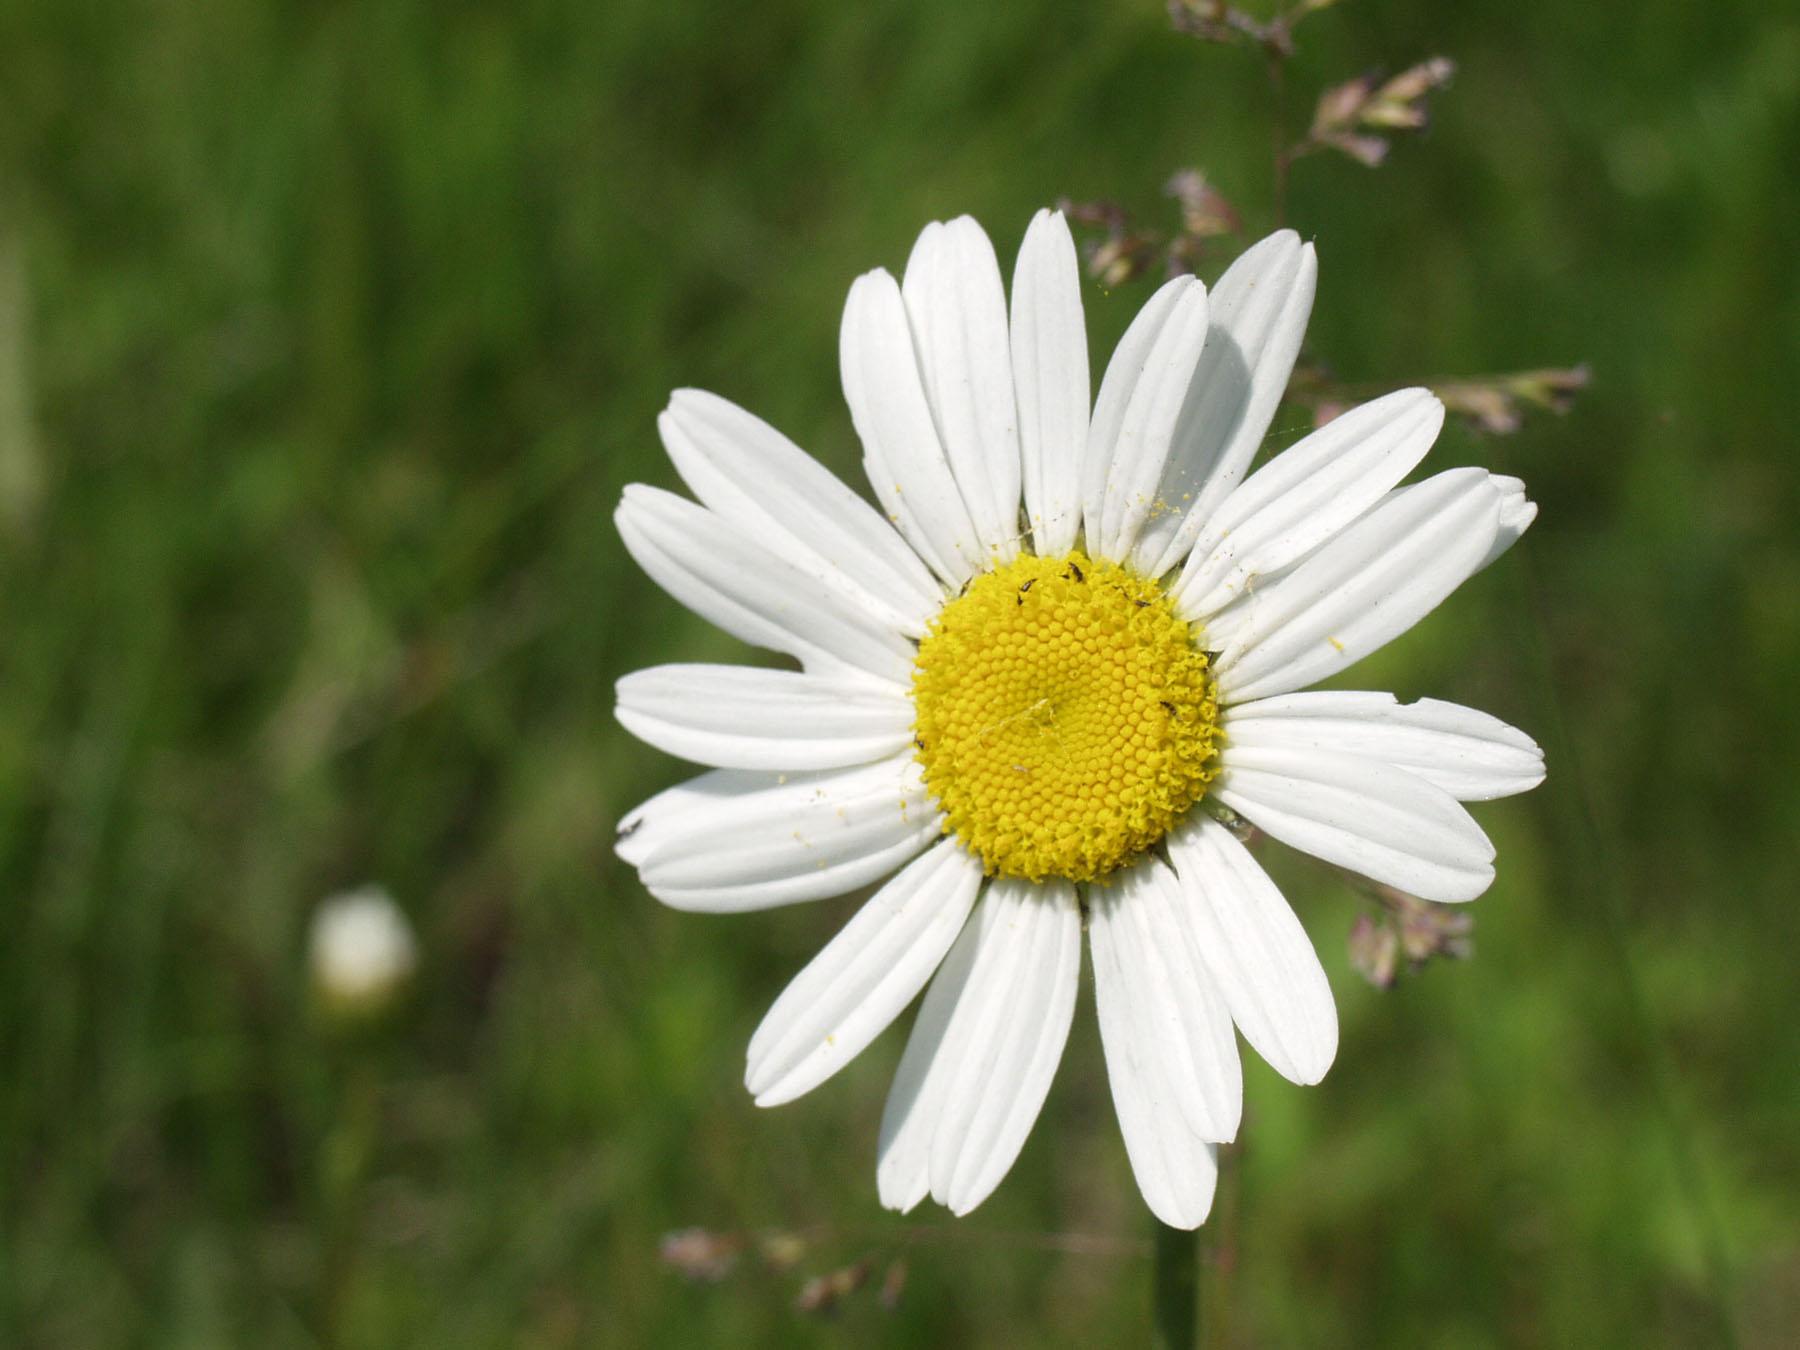 hinh anh hoa cuc dep 1